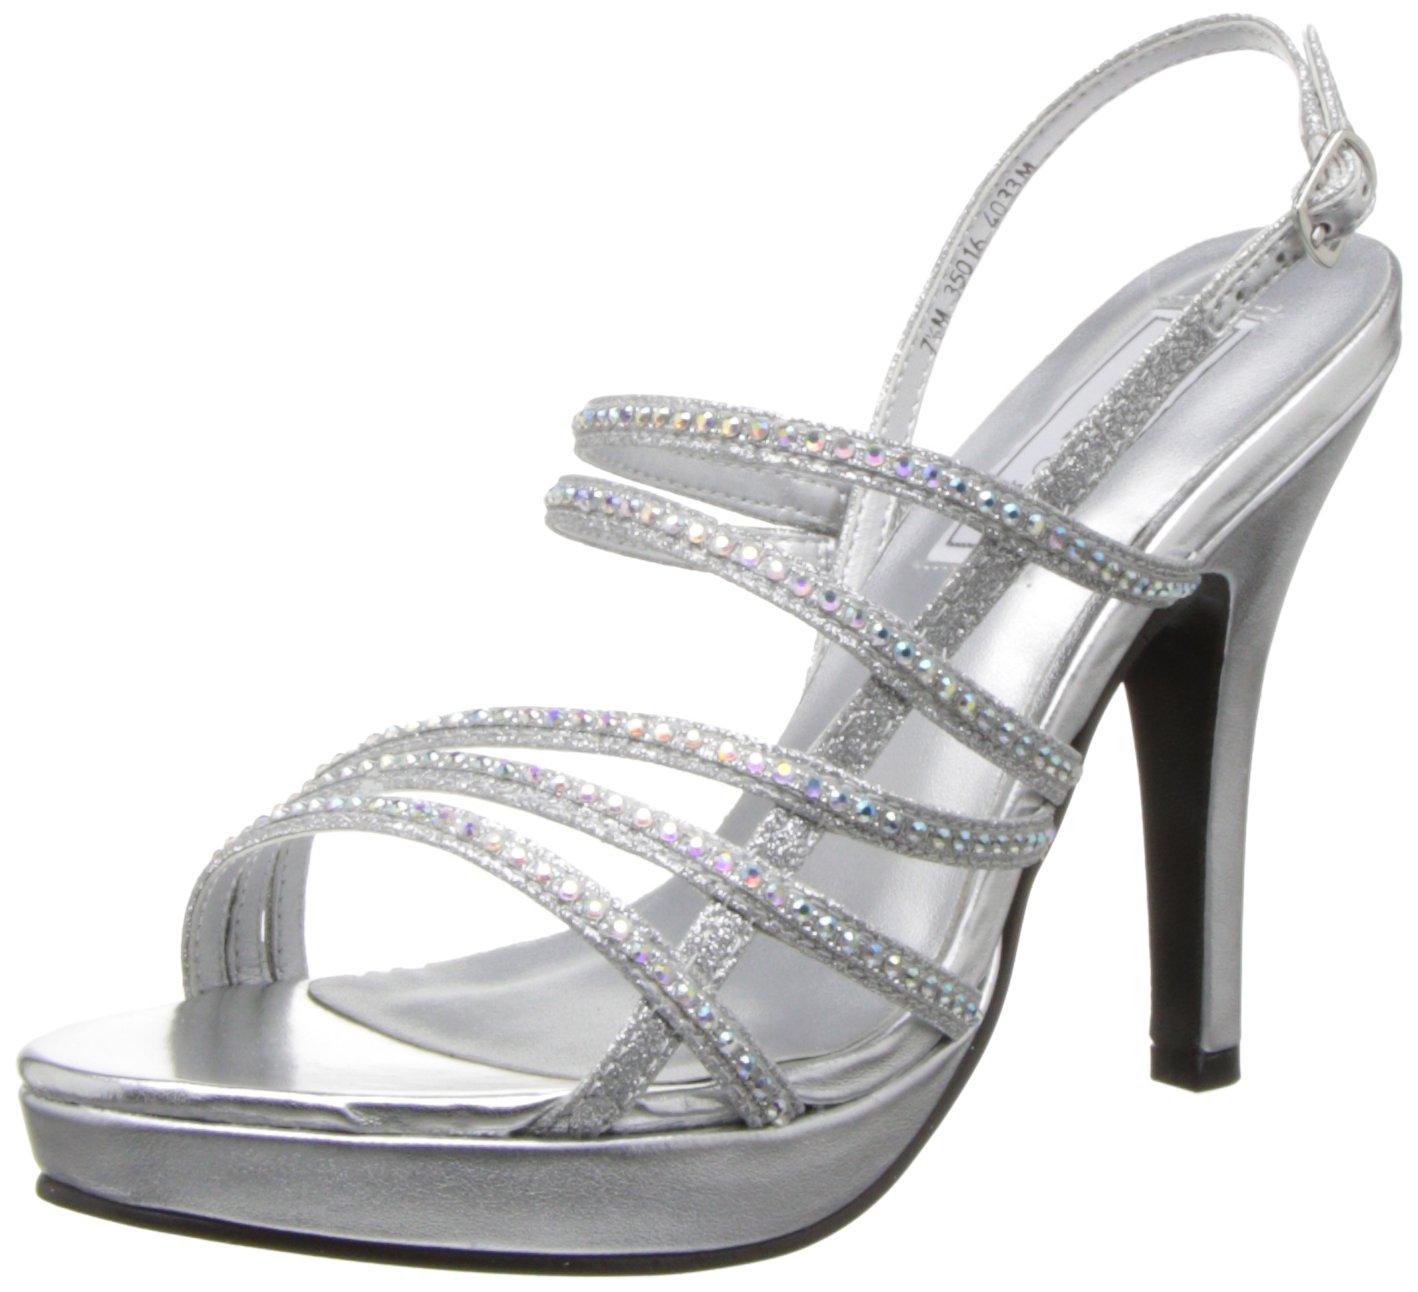 Touch Ups Women's Julie Platform Sandal B00G57VFRY 6 B(M) US|Silver Metallic